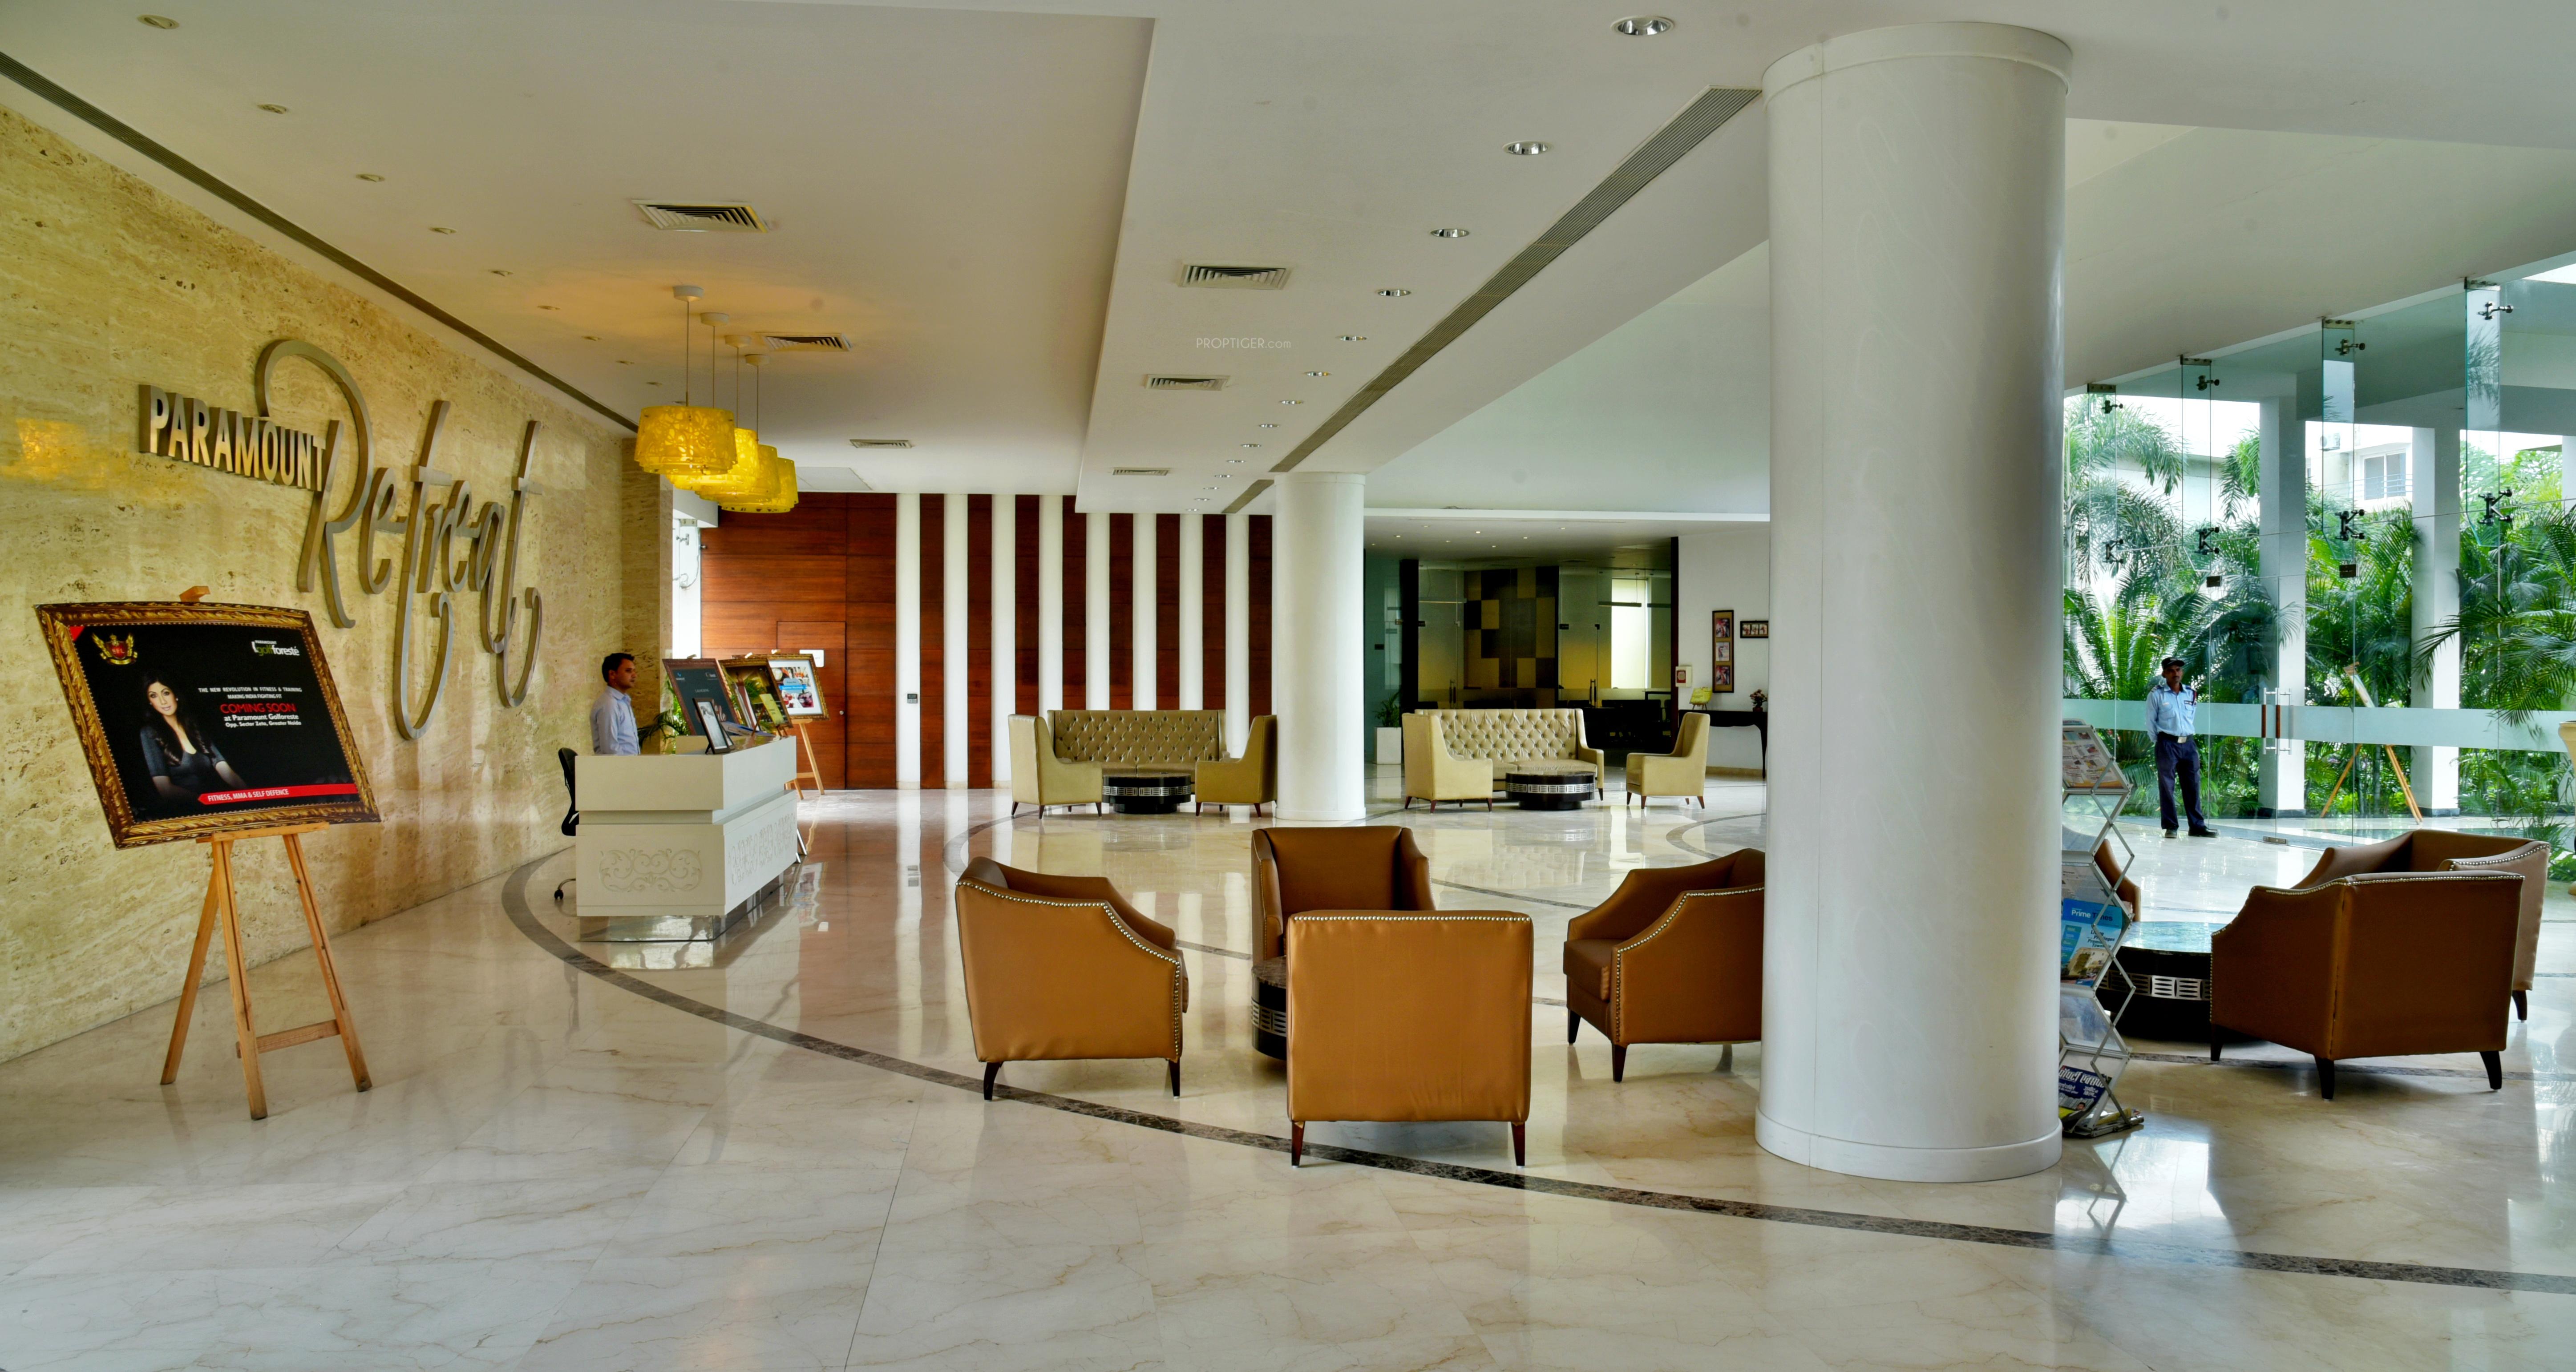 Paramount Golfforeste Villas In Zeta Greater Noida